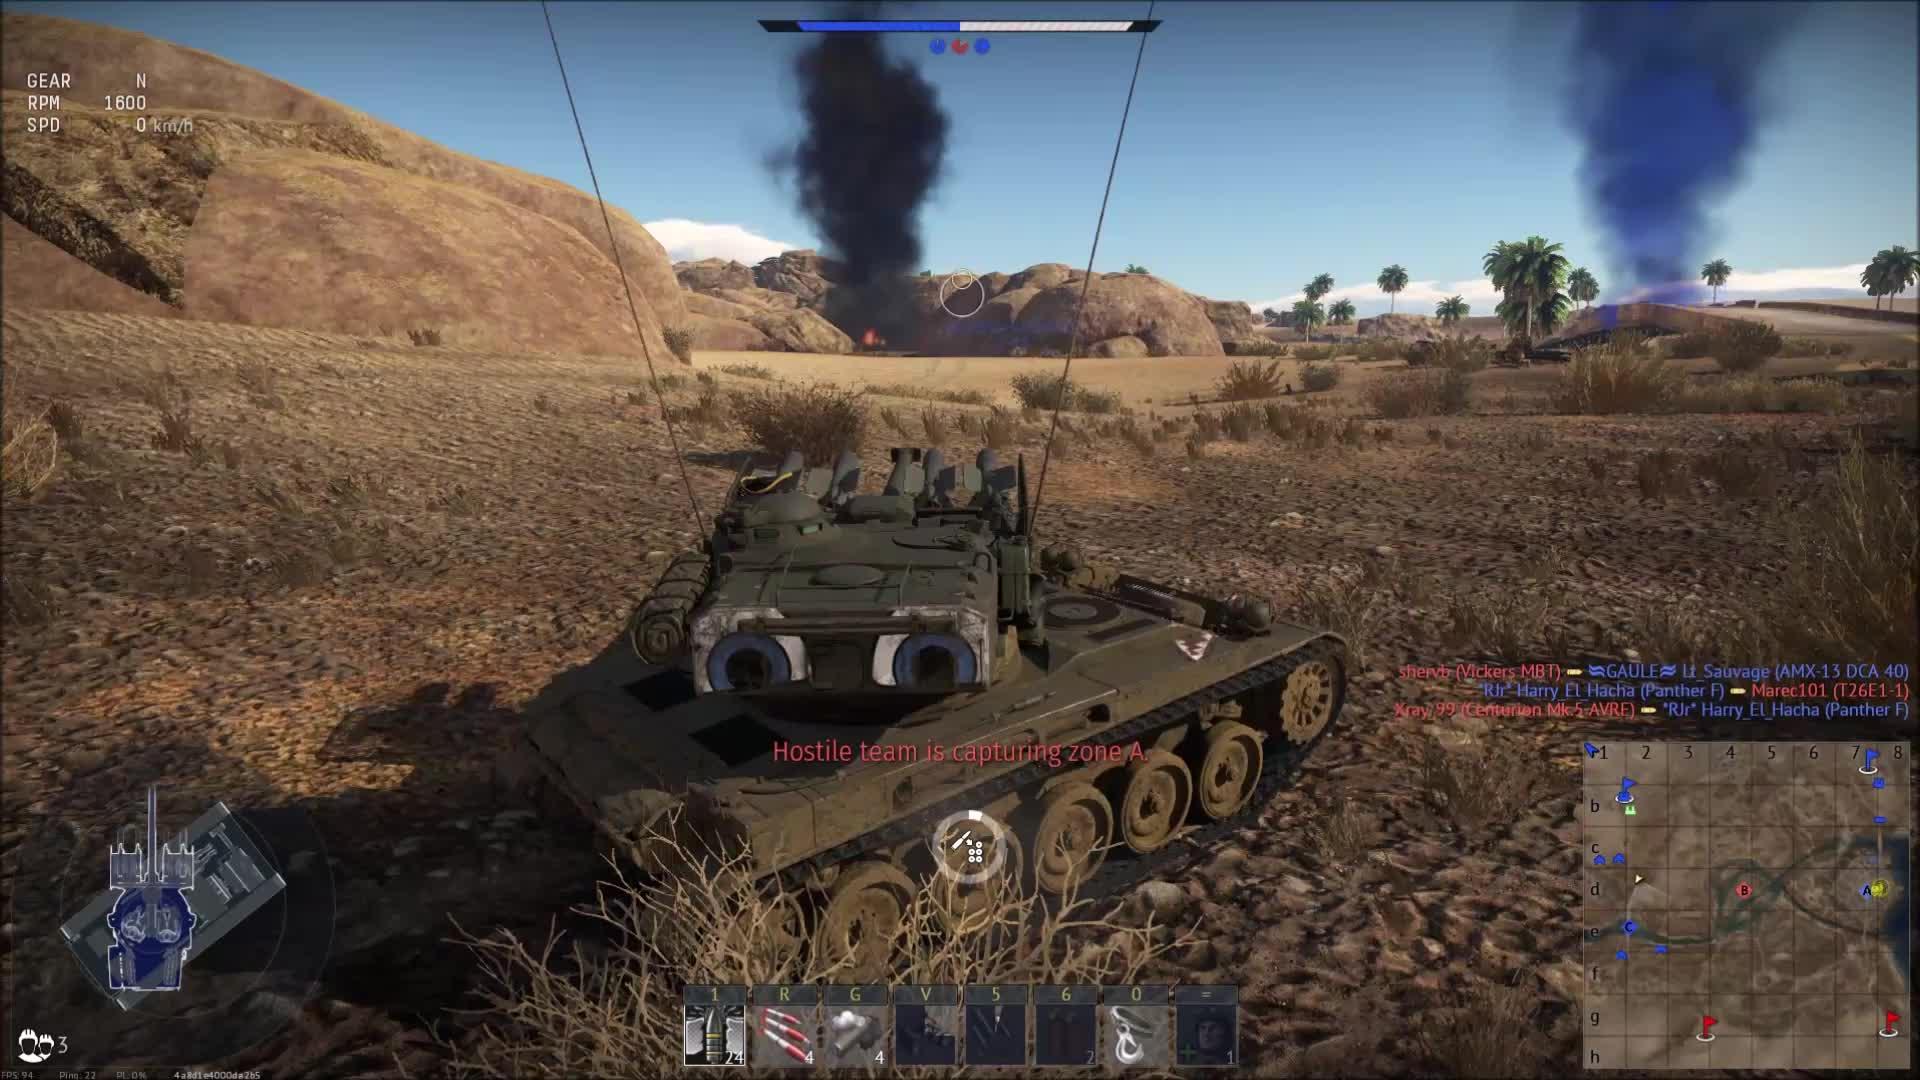 warthunder, Warthunder AMX13 ATGM GIFs